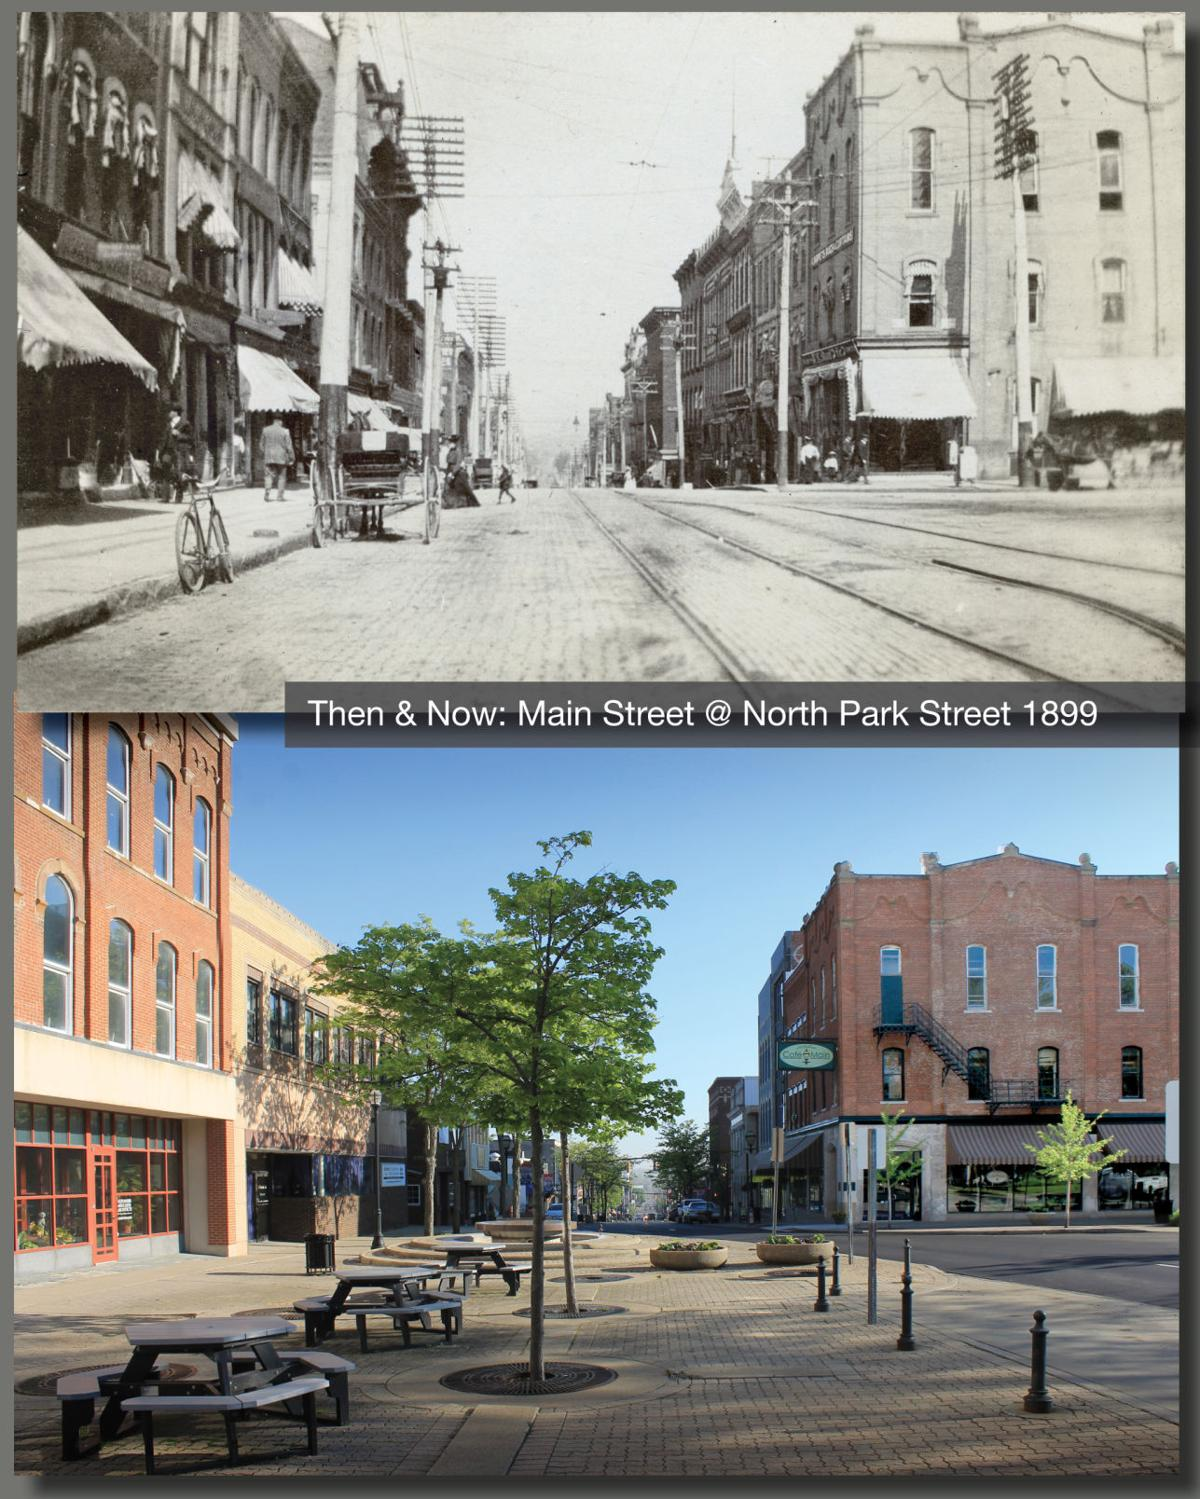 Then & Now: Main Street @ North Park Street